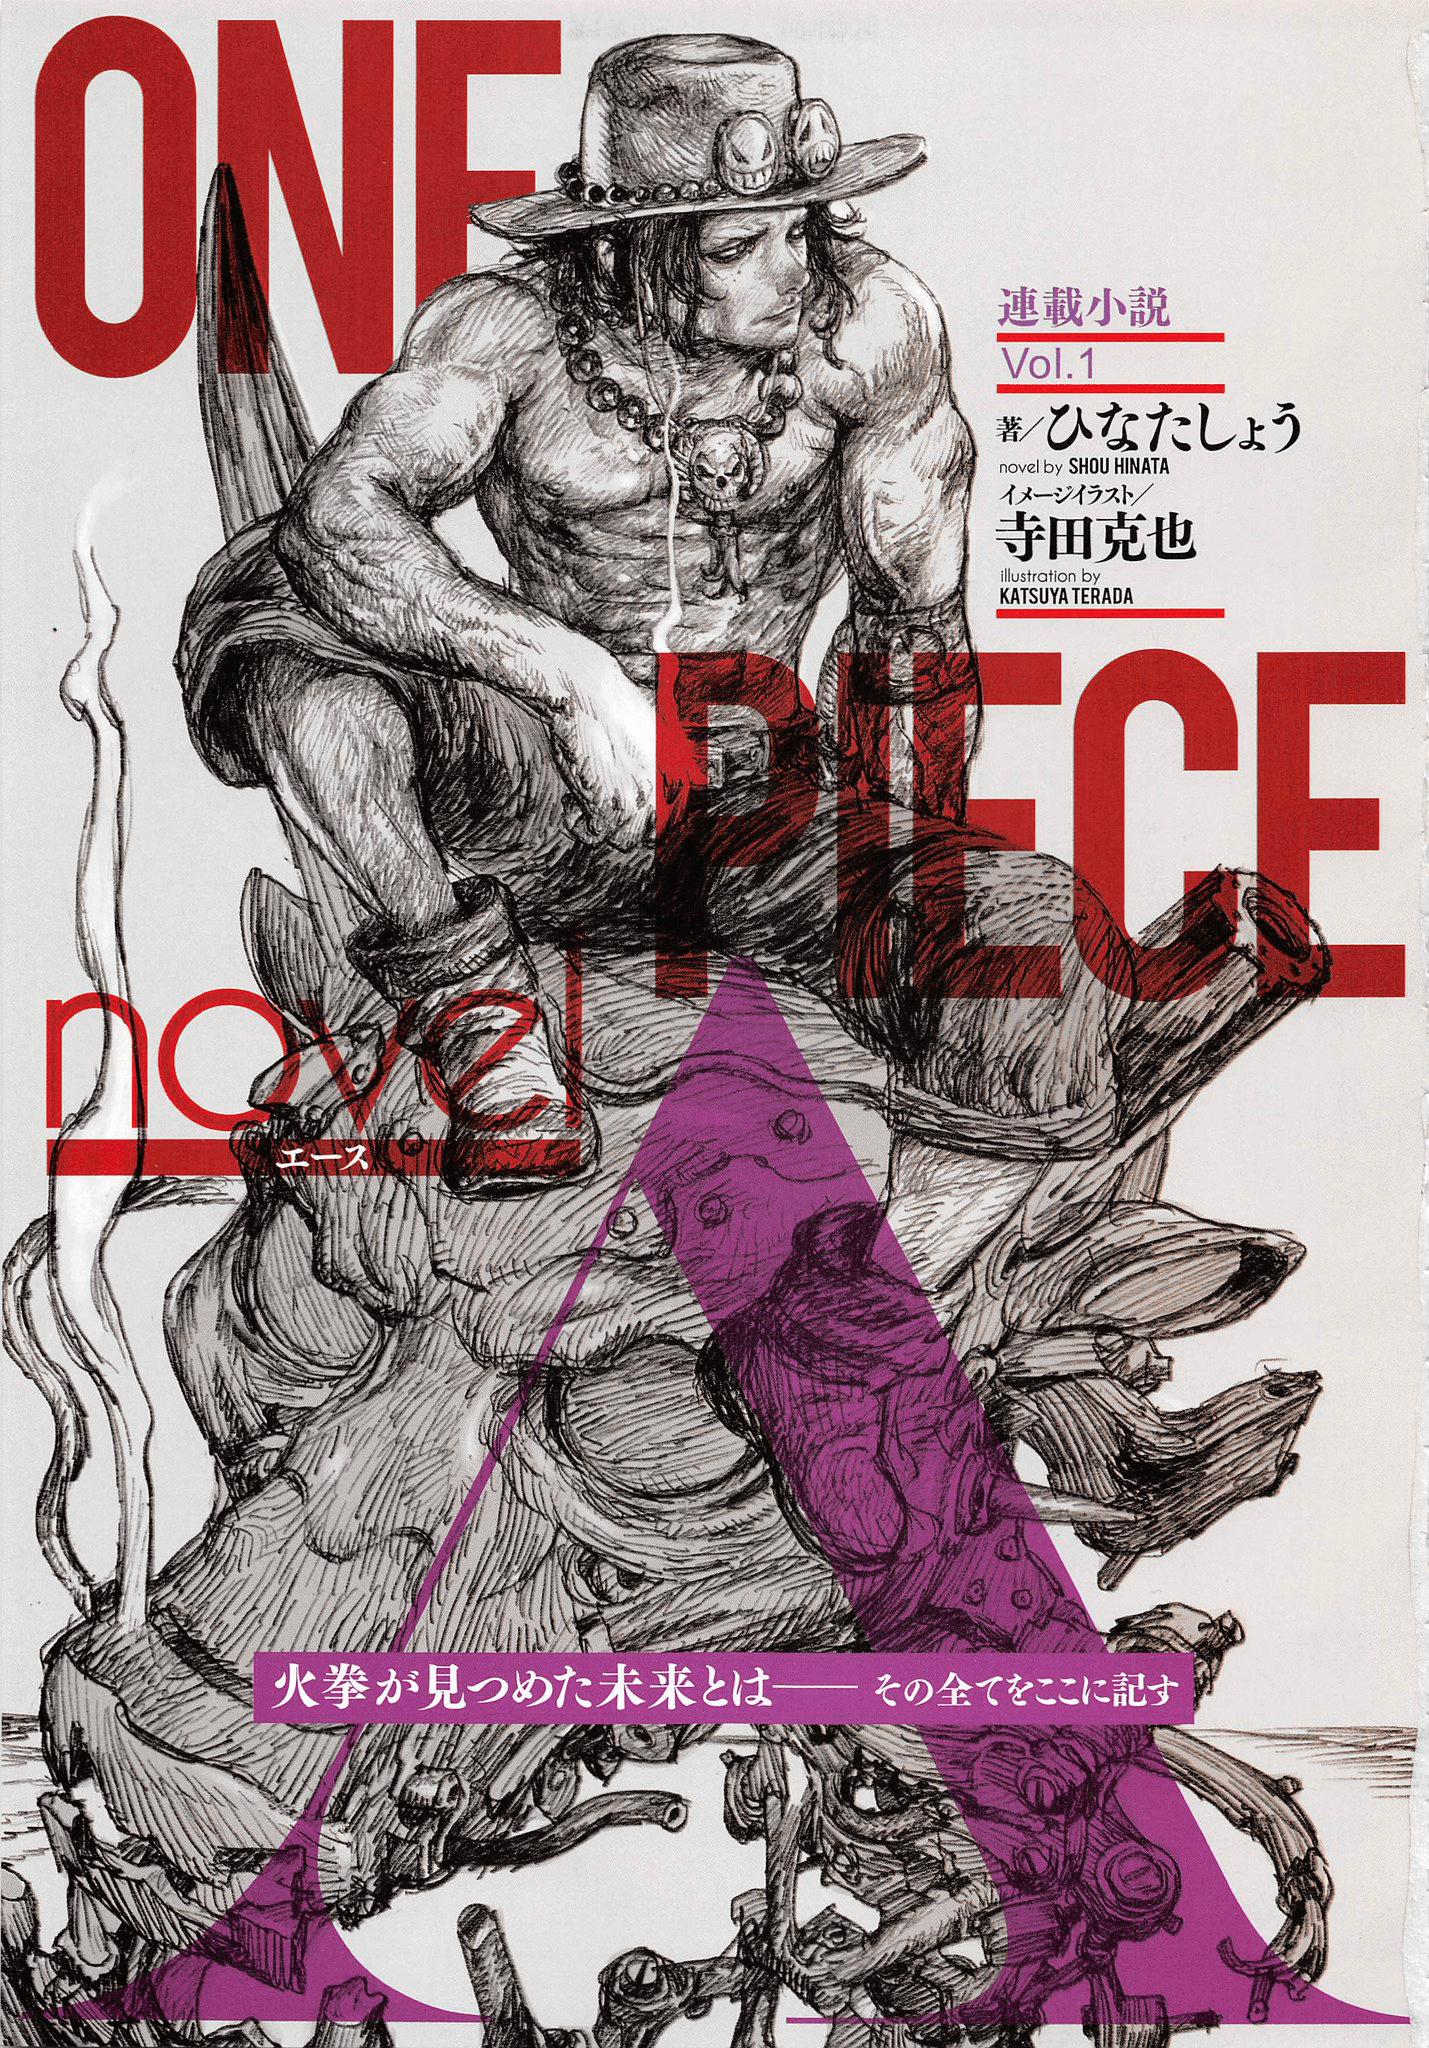 One Piece Novel A: la storia di Portgas D Ace | One Piece Mania